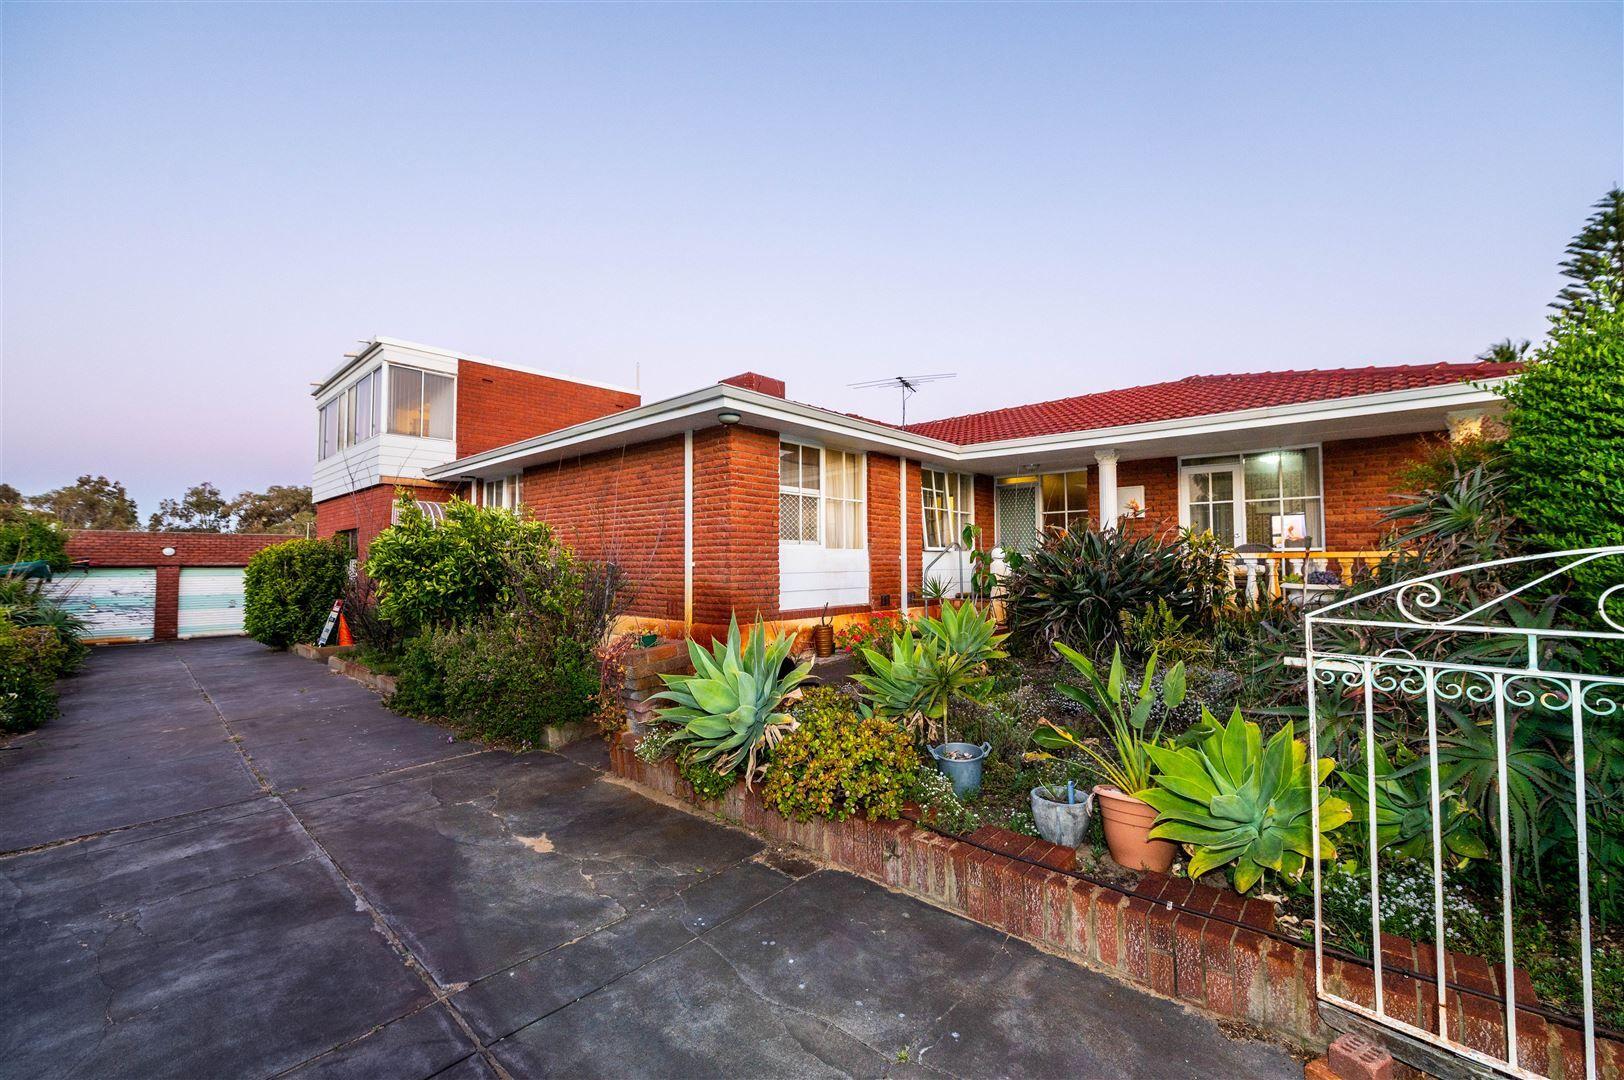 4 bedrooms House in 23 Wincanton Road KARRINYUP WA, 6018